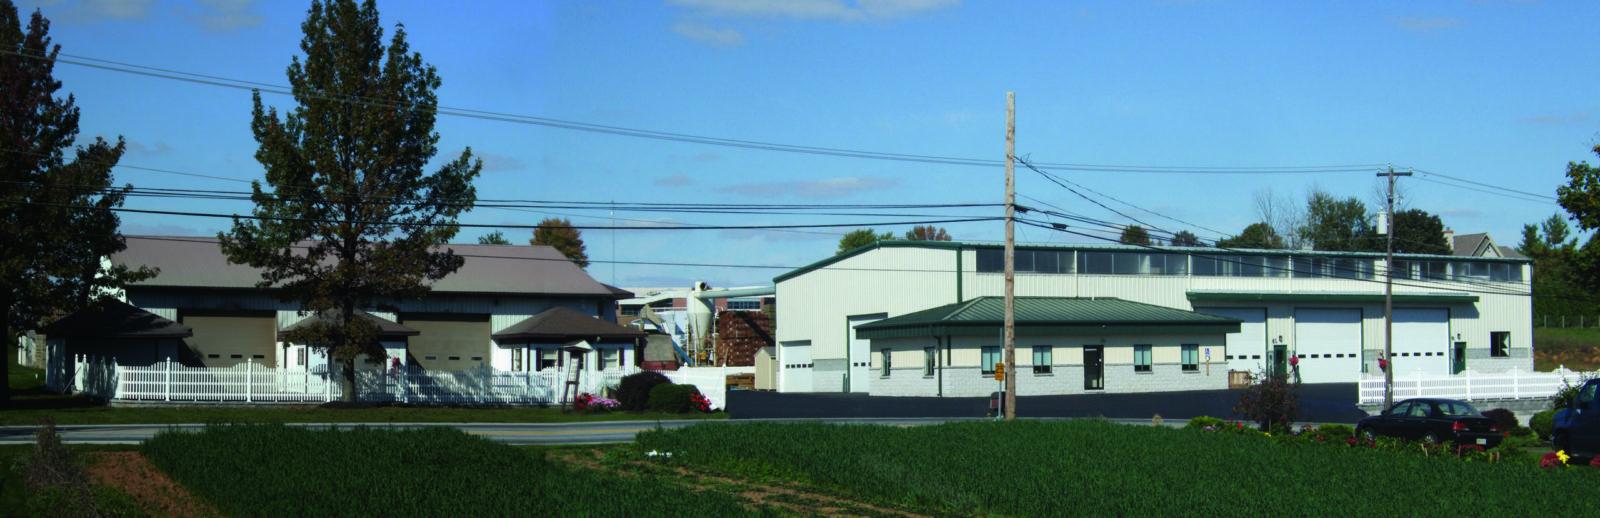 location of amish pavilions manufacturer